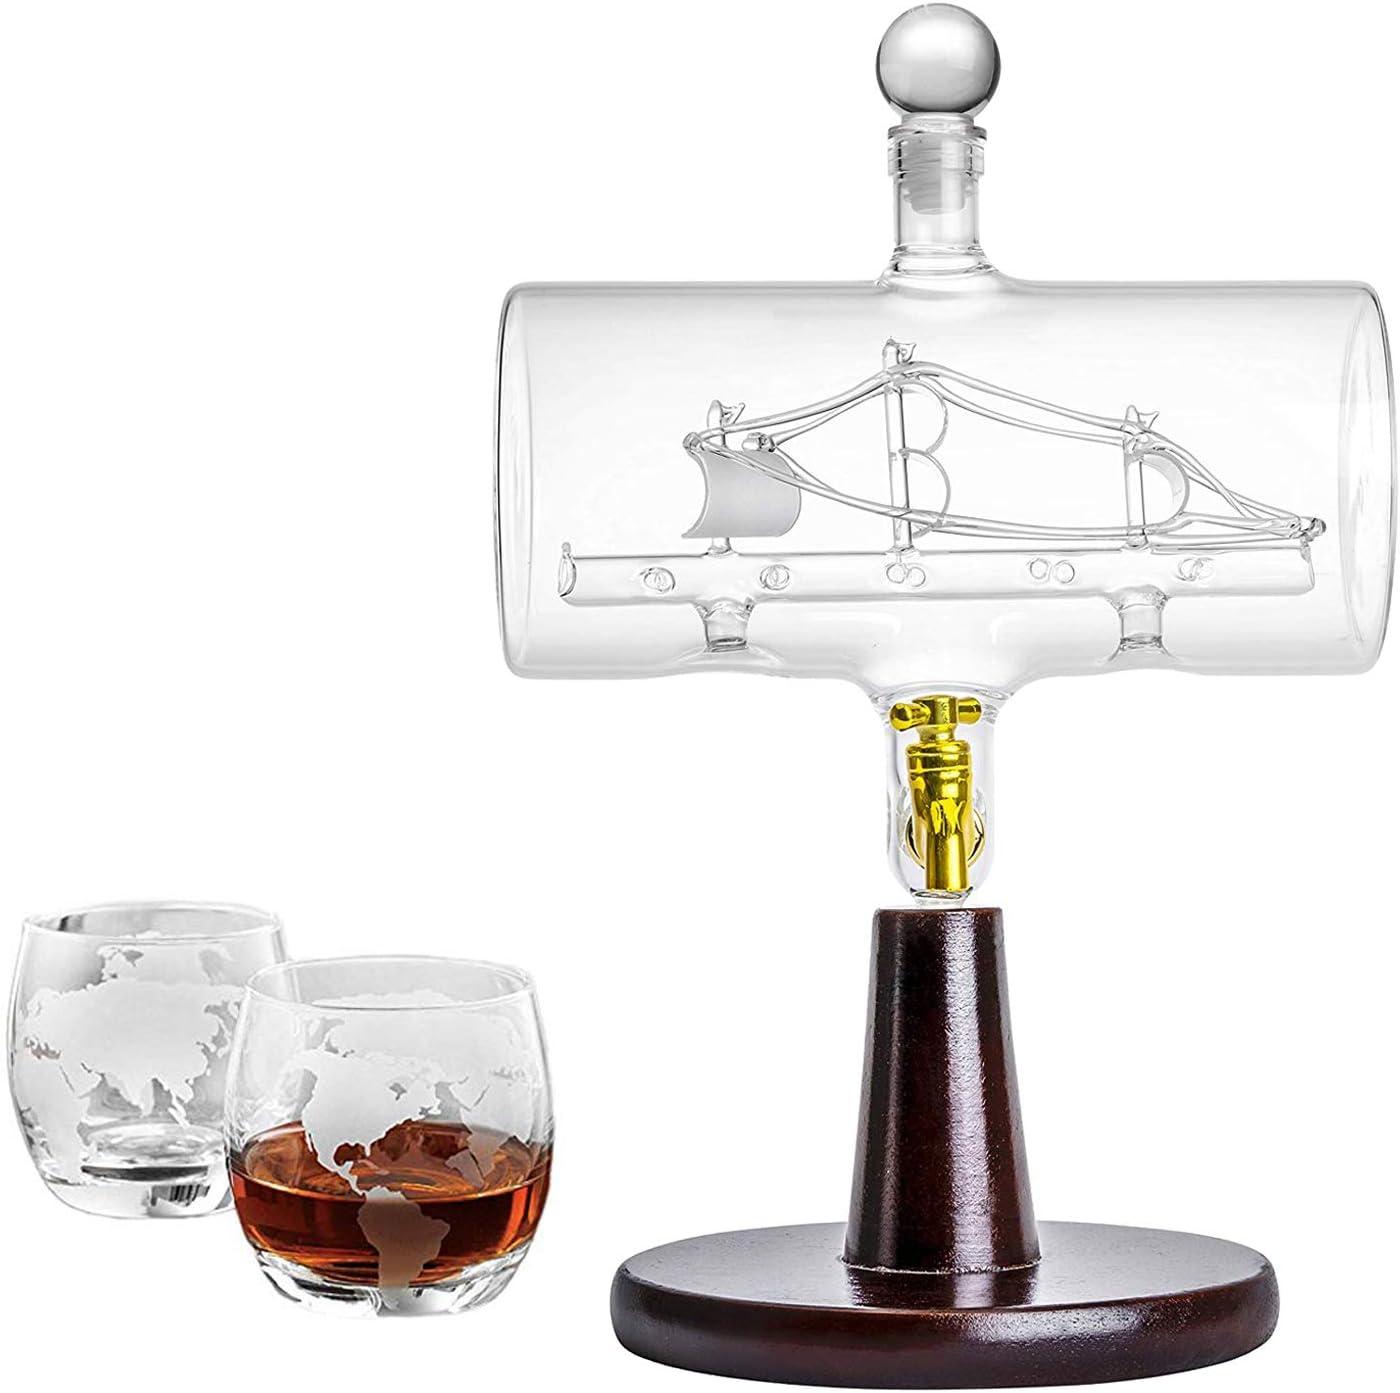 Large 40 Oz 'Magellan' Handmade Whiskey Dispenser Liquor Decanter with Ship inside, Wooden Stand, Bar Funnel and 2 Globe GLasses